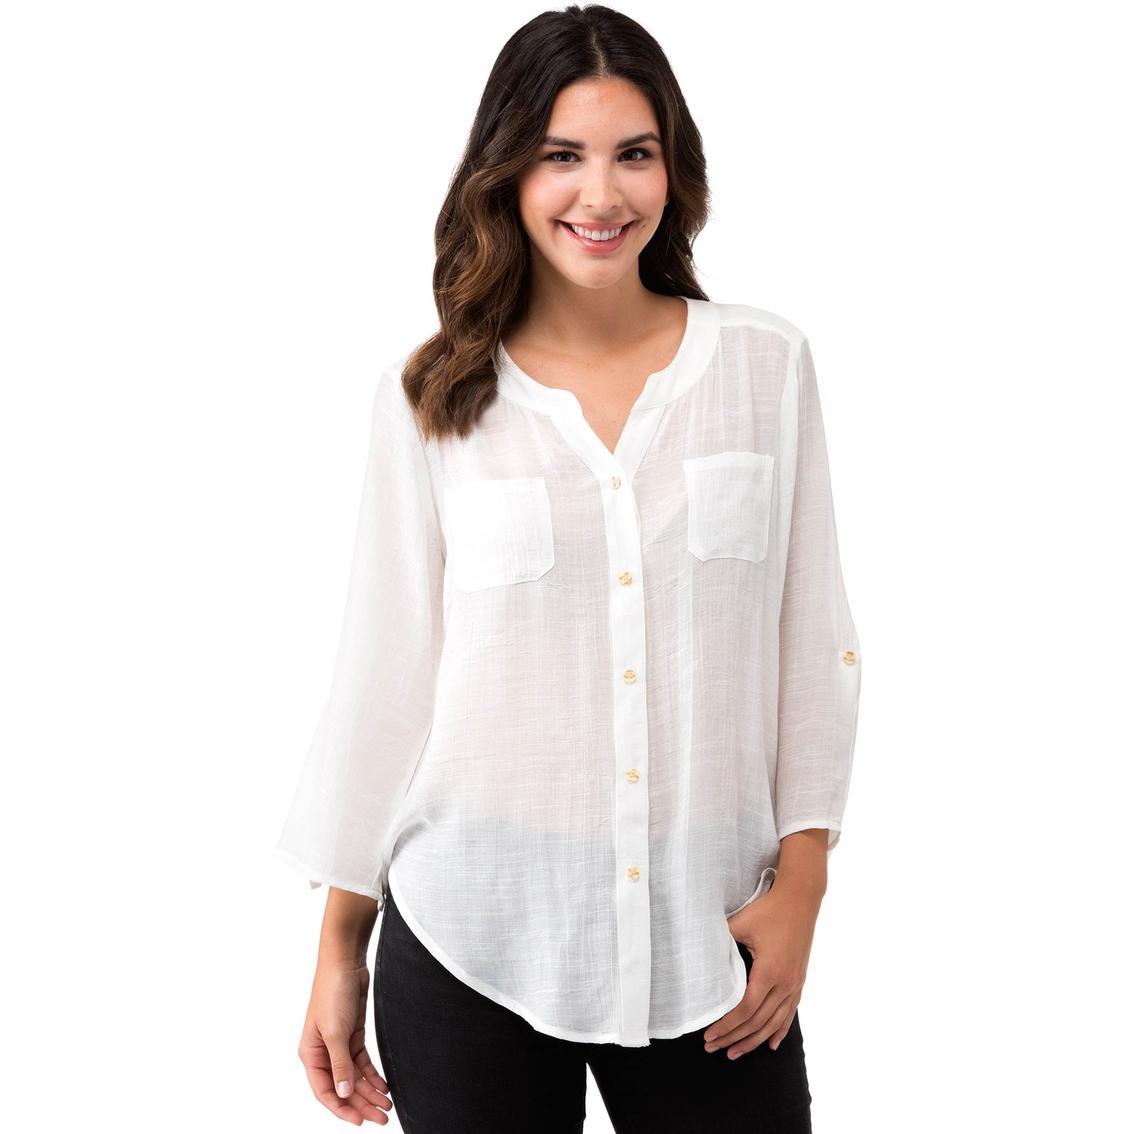 Agb Solid Gauze Tab Collar Shirt Blouses Tunics Apparel Shop